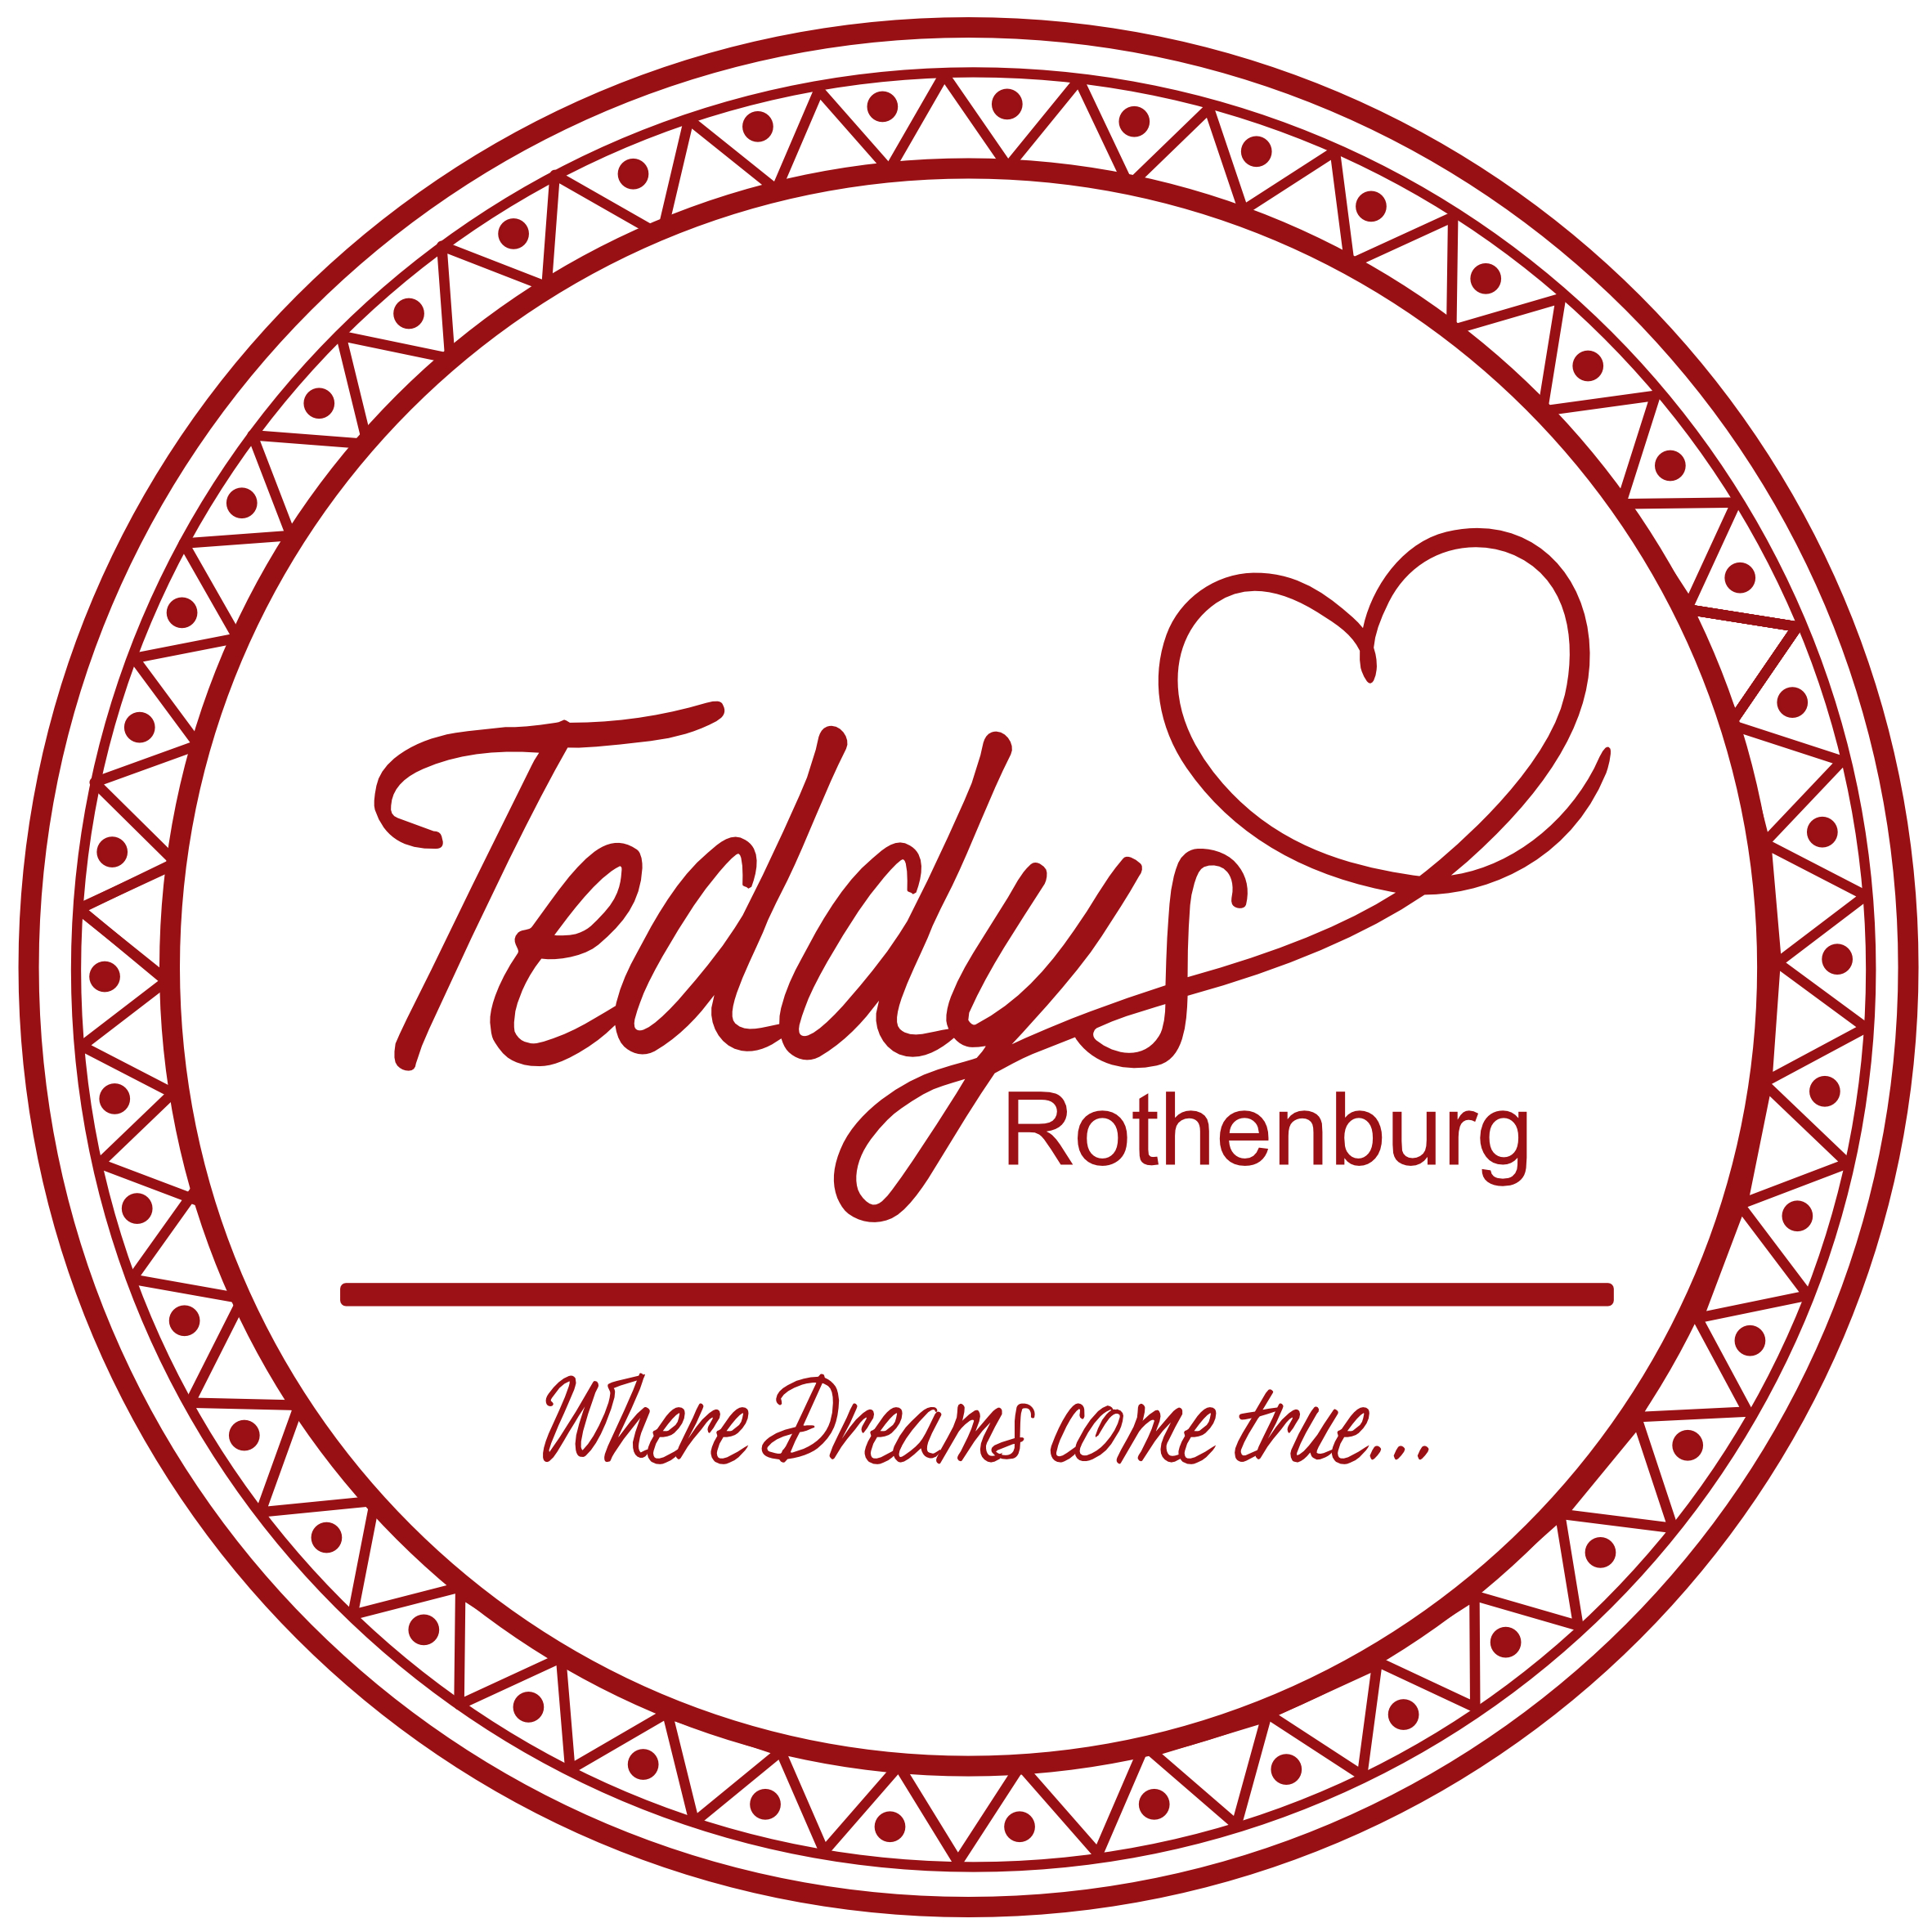 Teddys Rothenburg